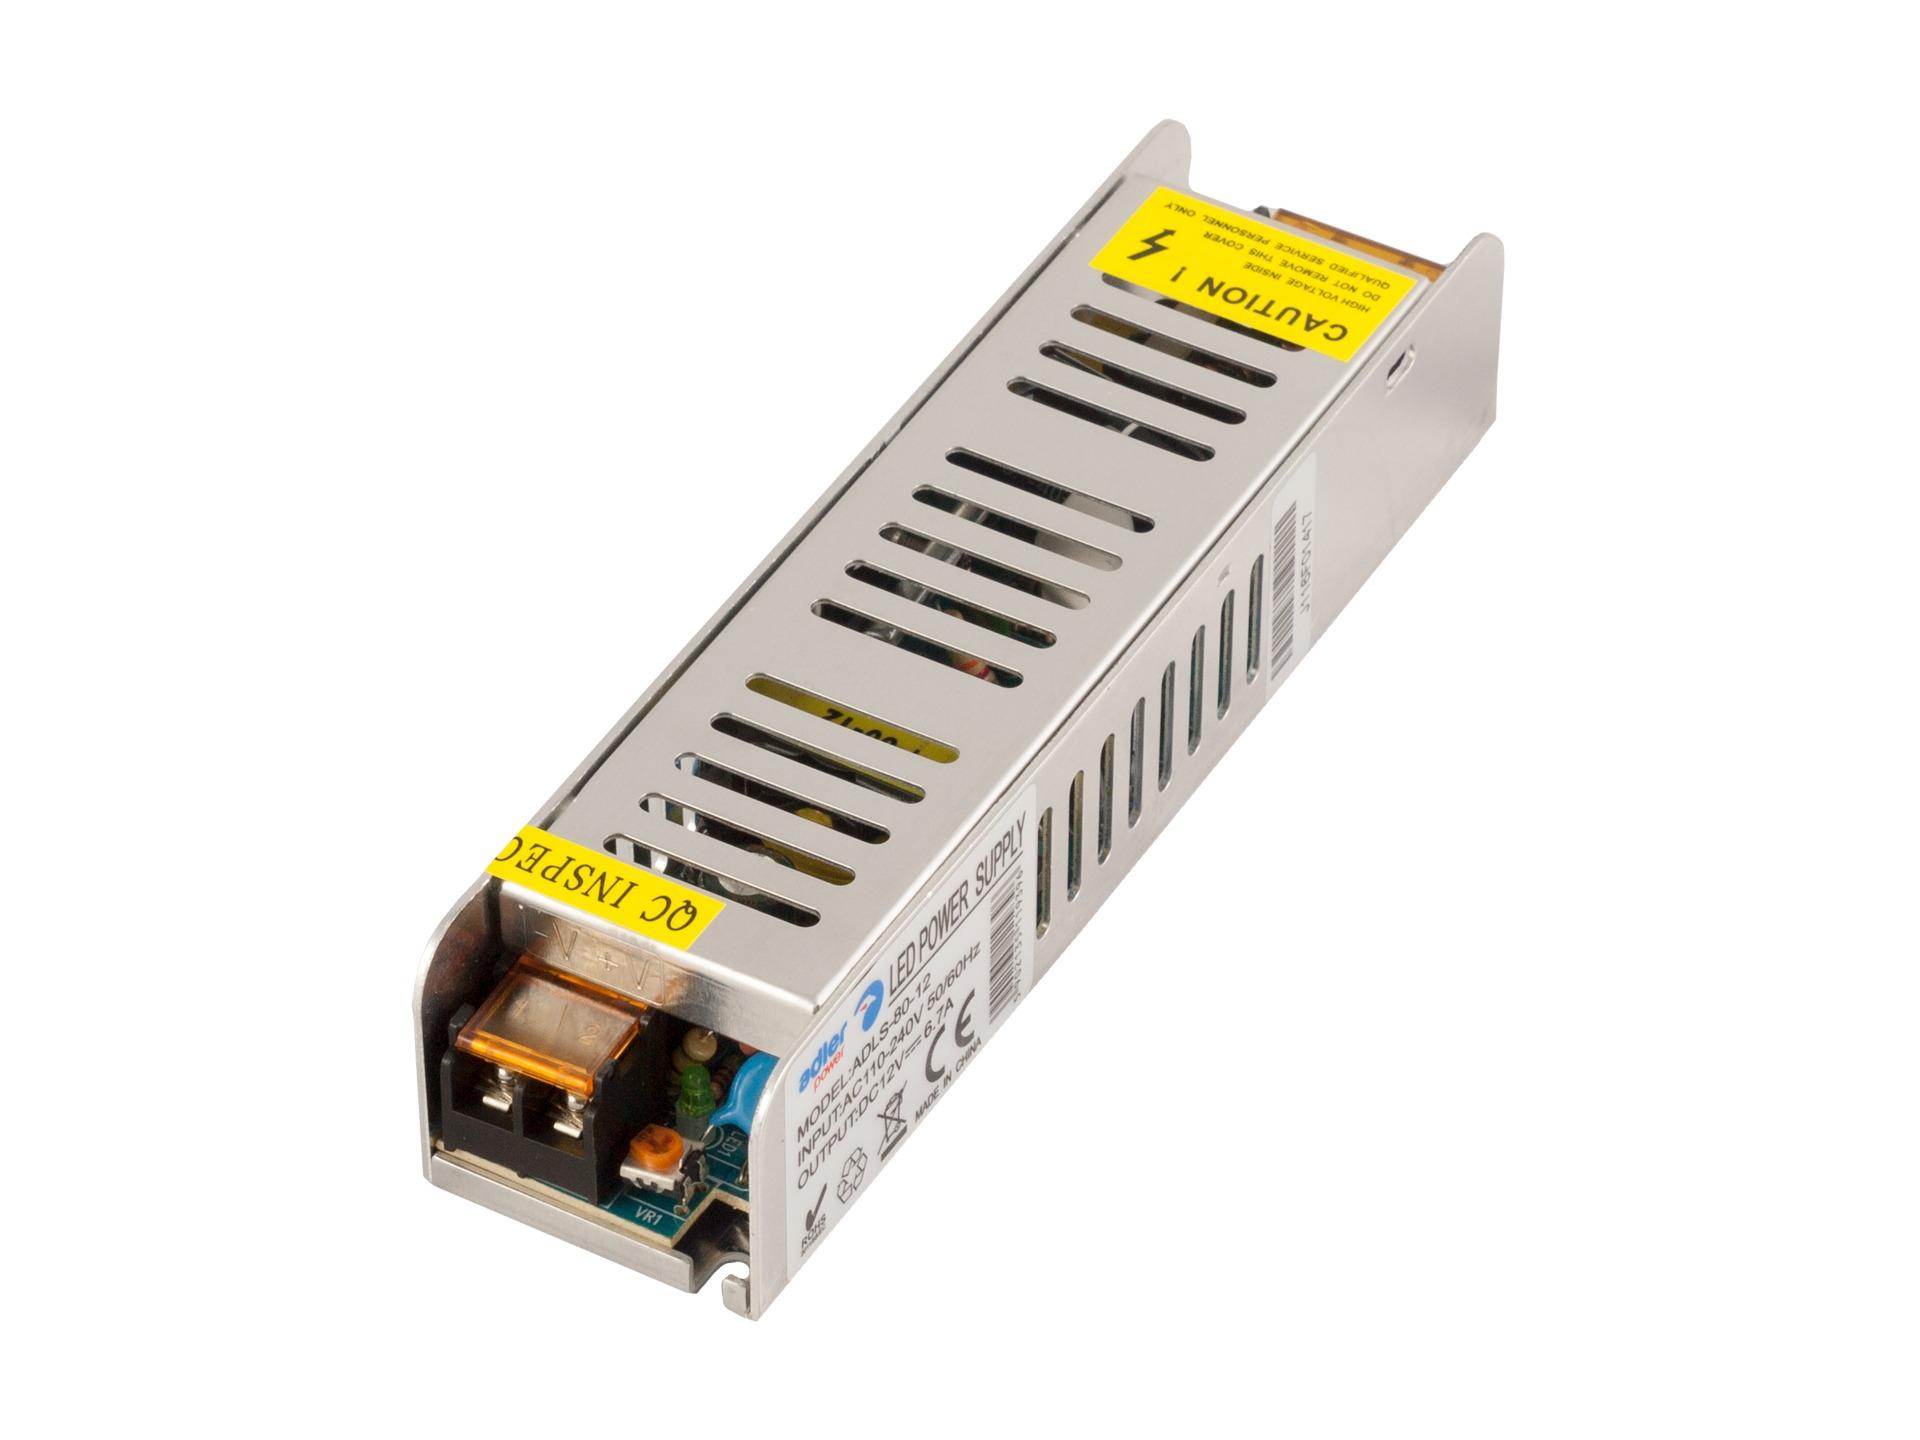 ADLS-80-12